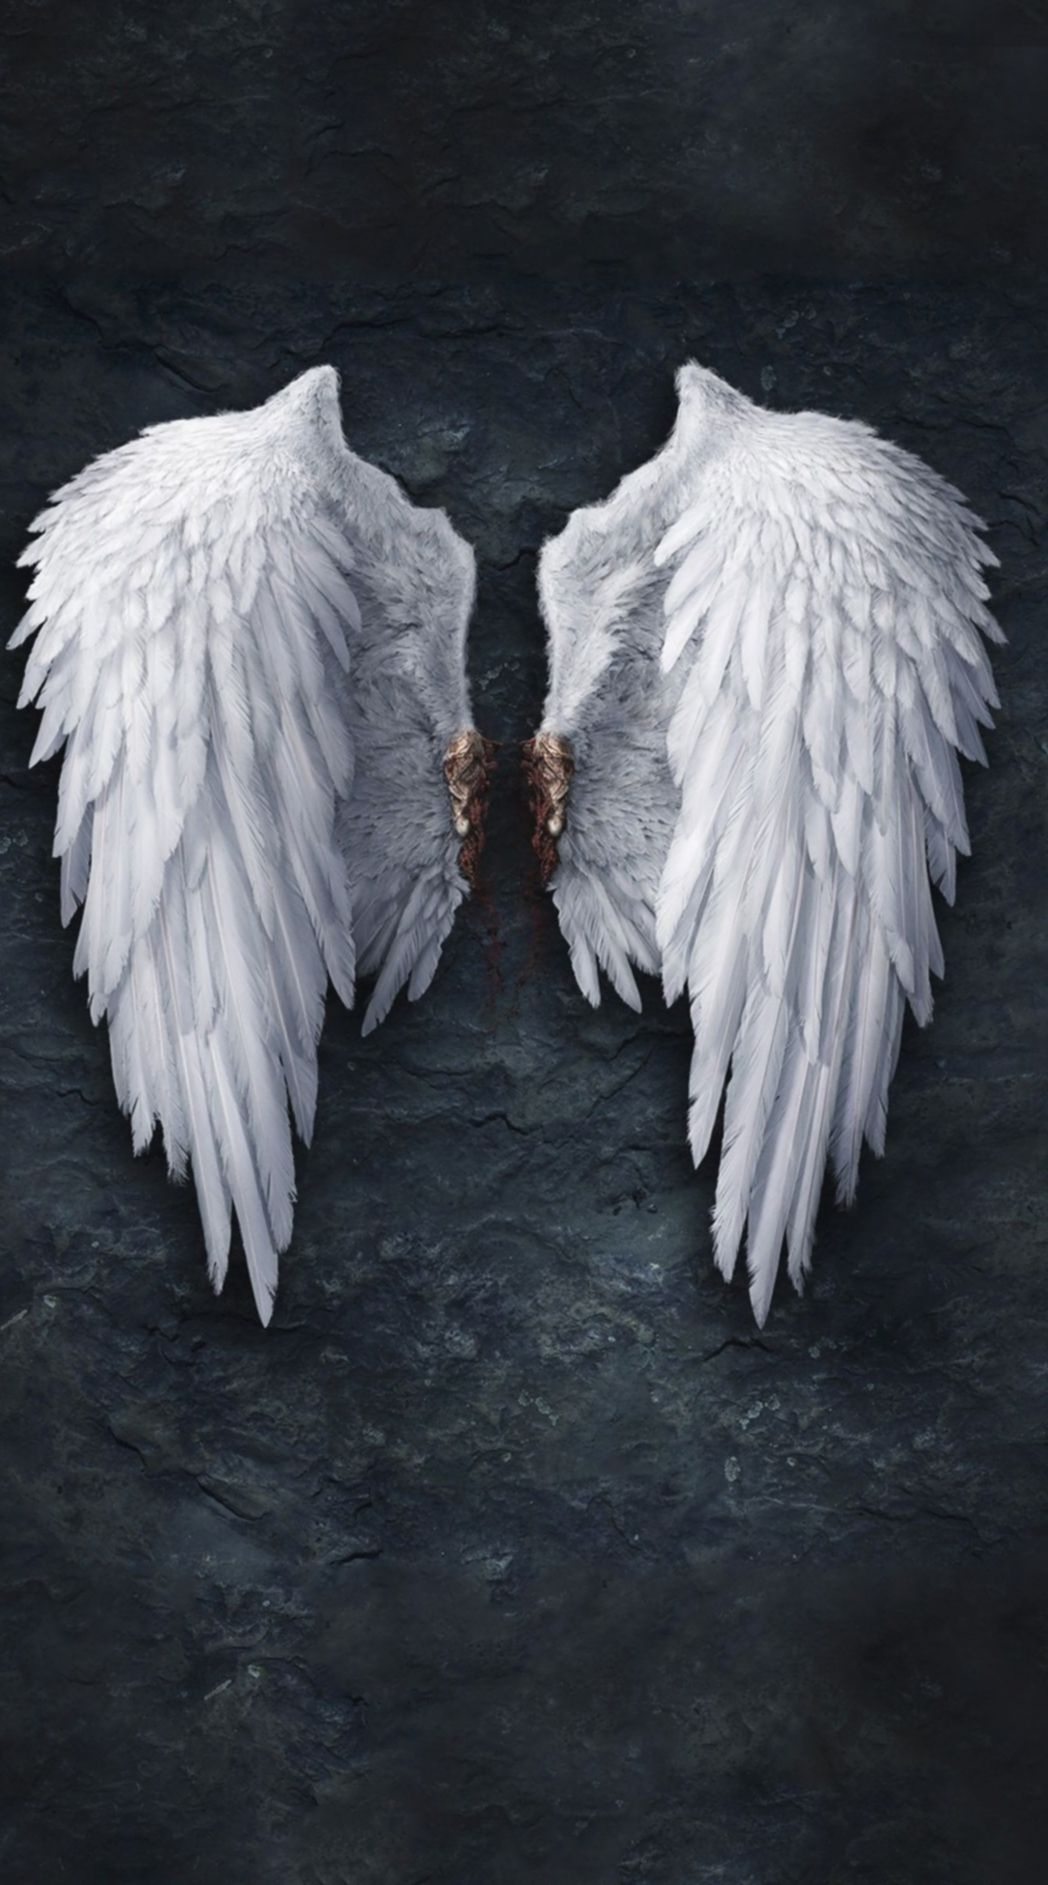 Lucifer Mobile Hd Wallpaper Wallpaper Mobile Iphone Angel Wings Hd Wallpaper Angel Wings Background Angel Wings Hd